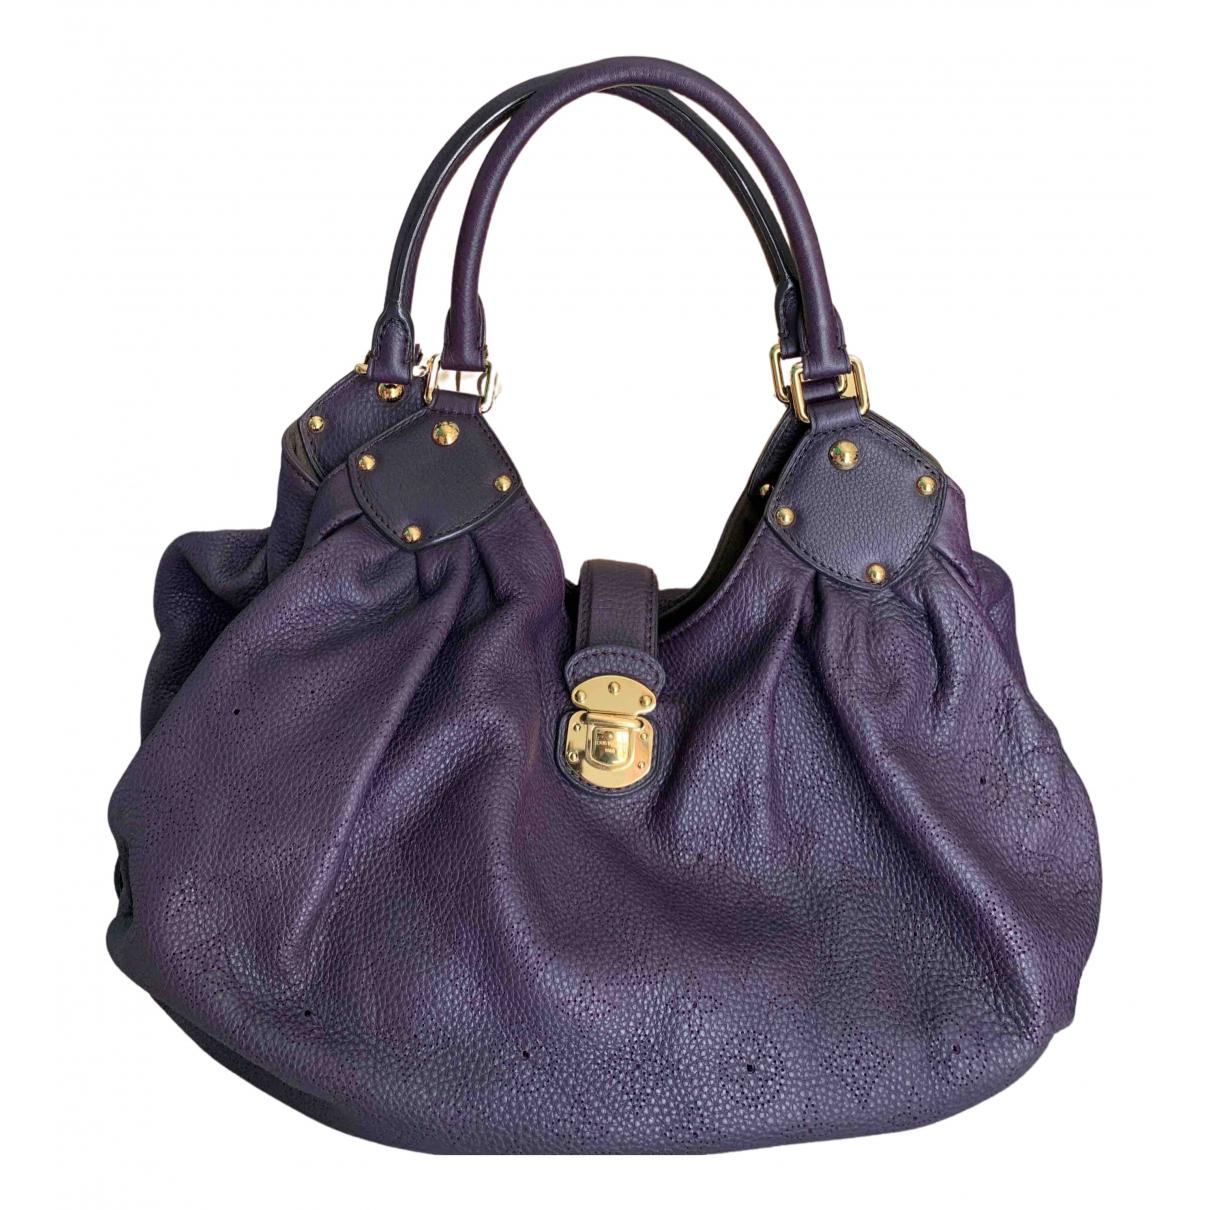 Louis Vuitton Mahina Handtasche in  Lila Leder